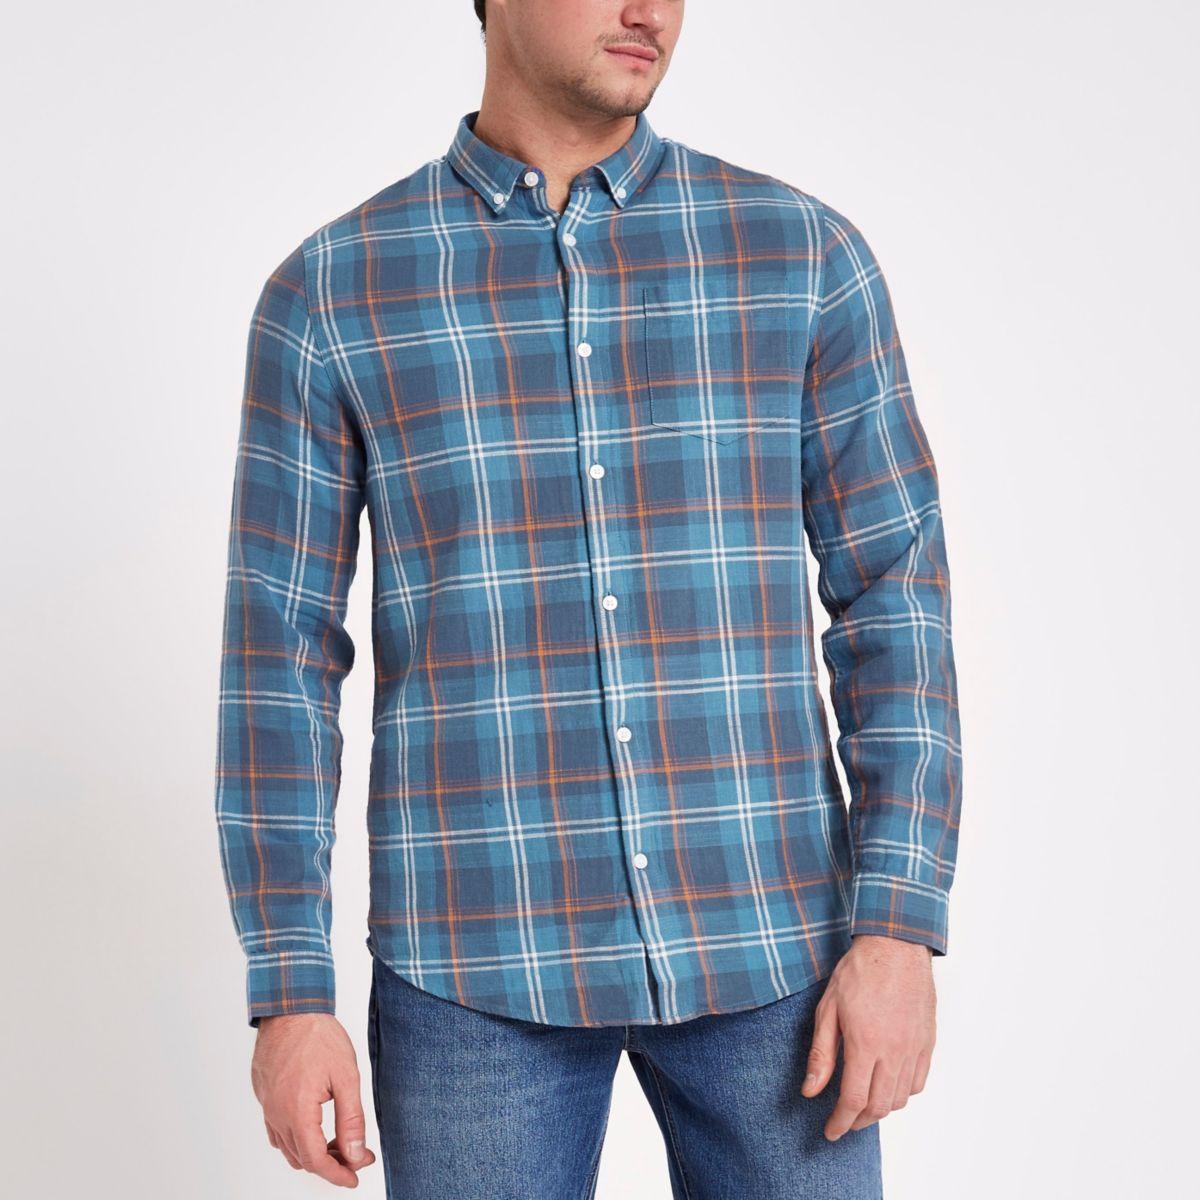 Blue check button-down shirt